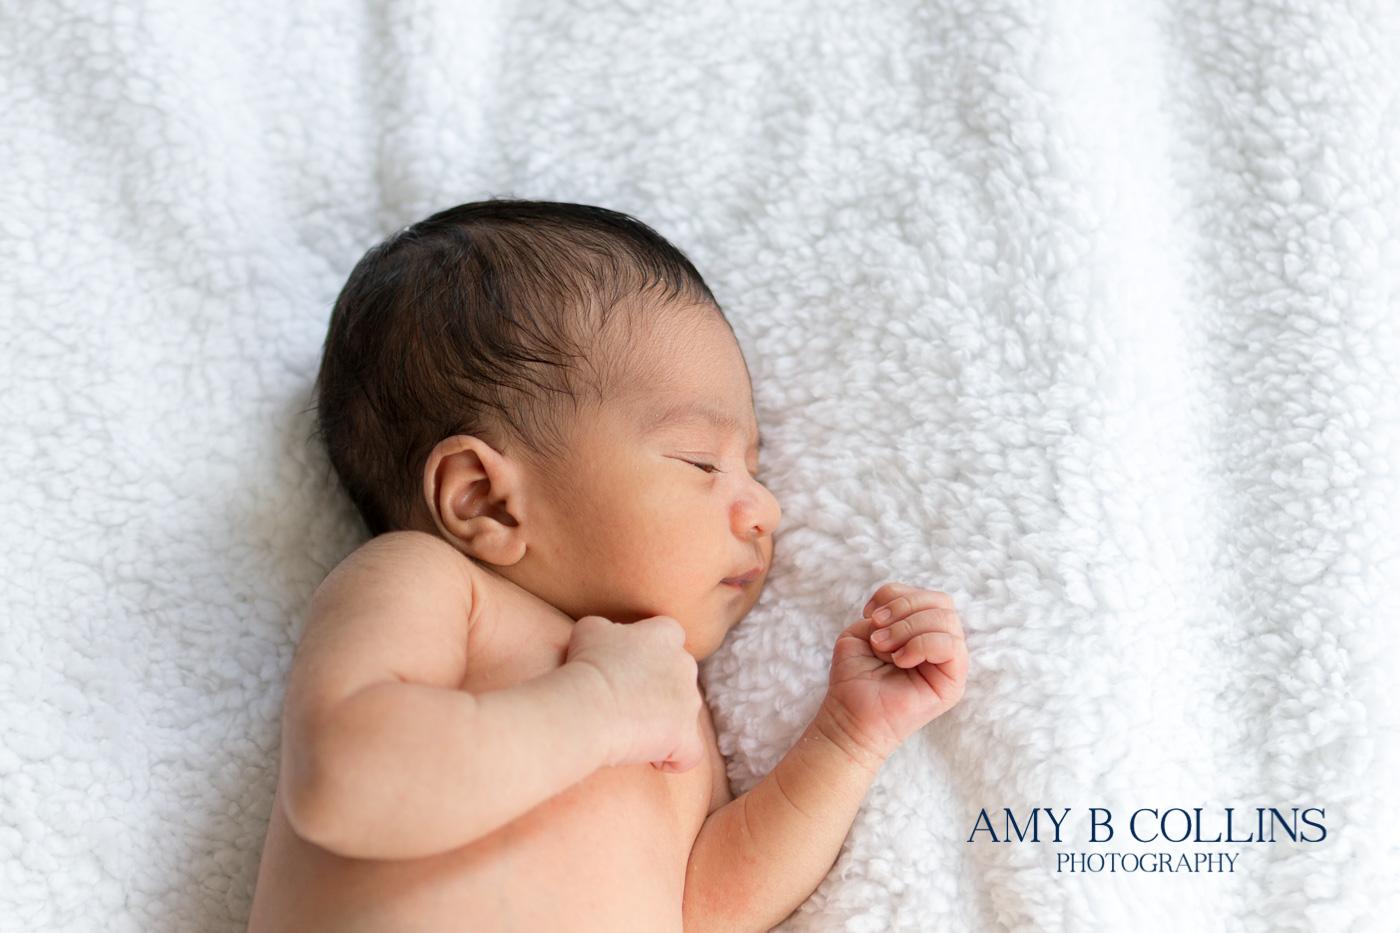 Amy_B_Collins_Photography_Newton - 05.jpg